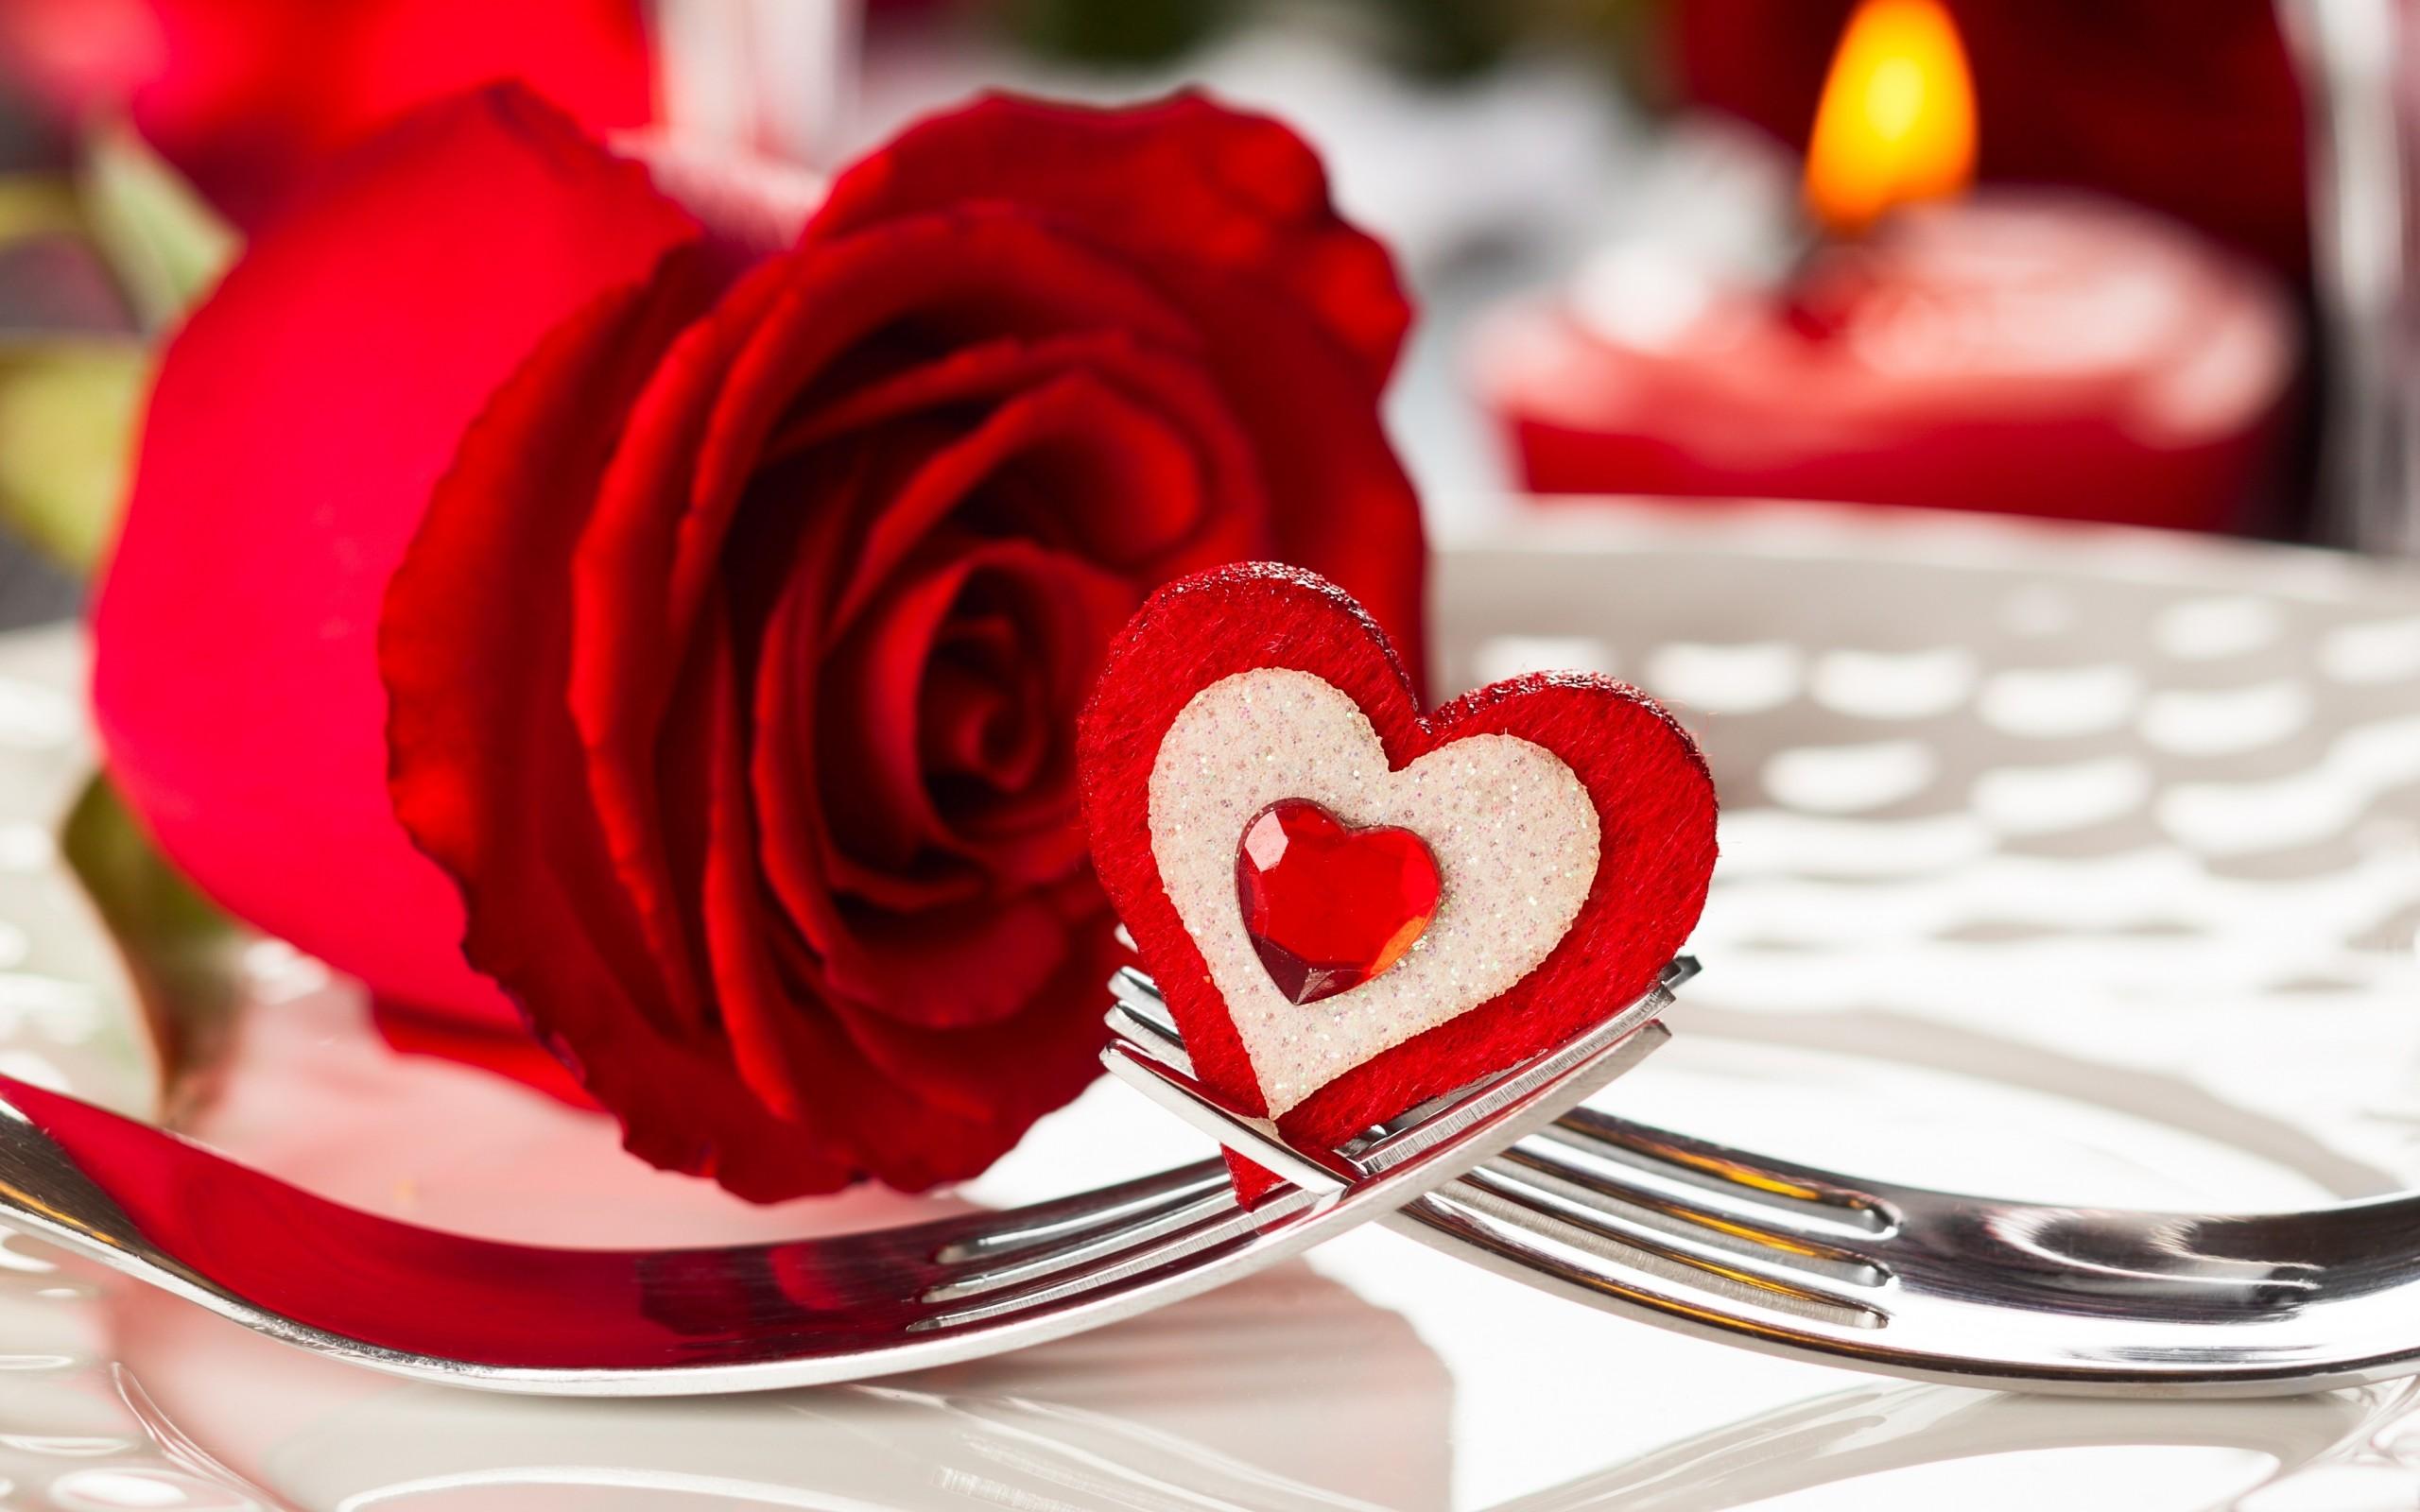 Red roses wallpaper heart